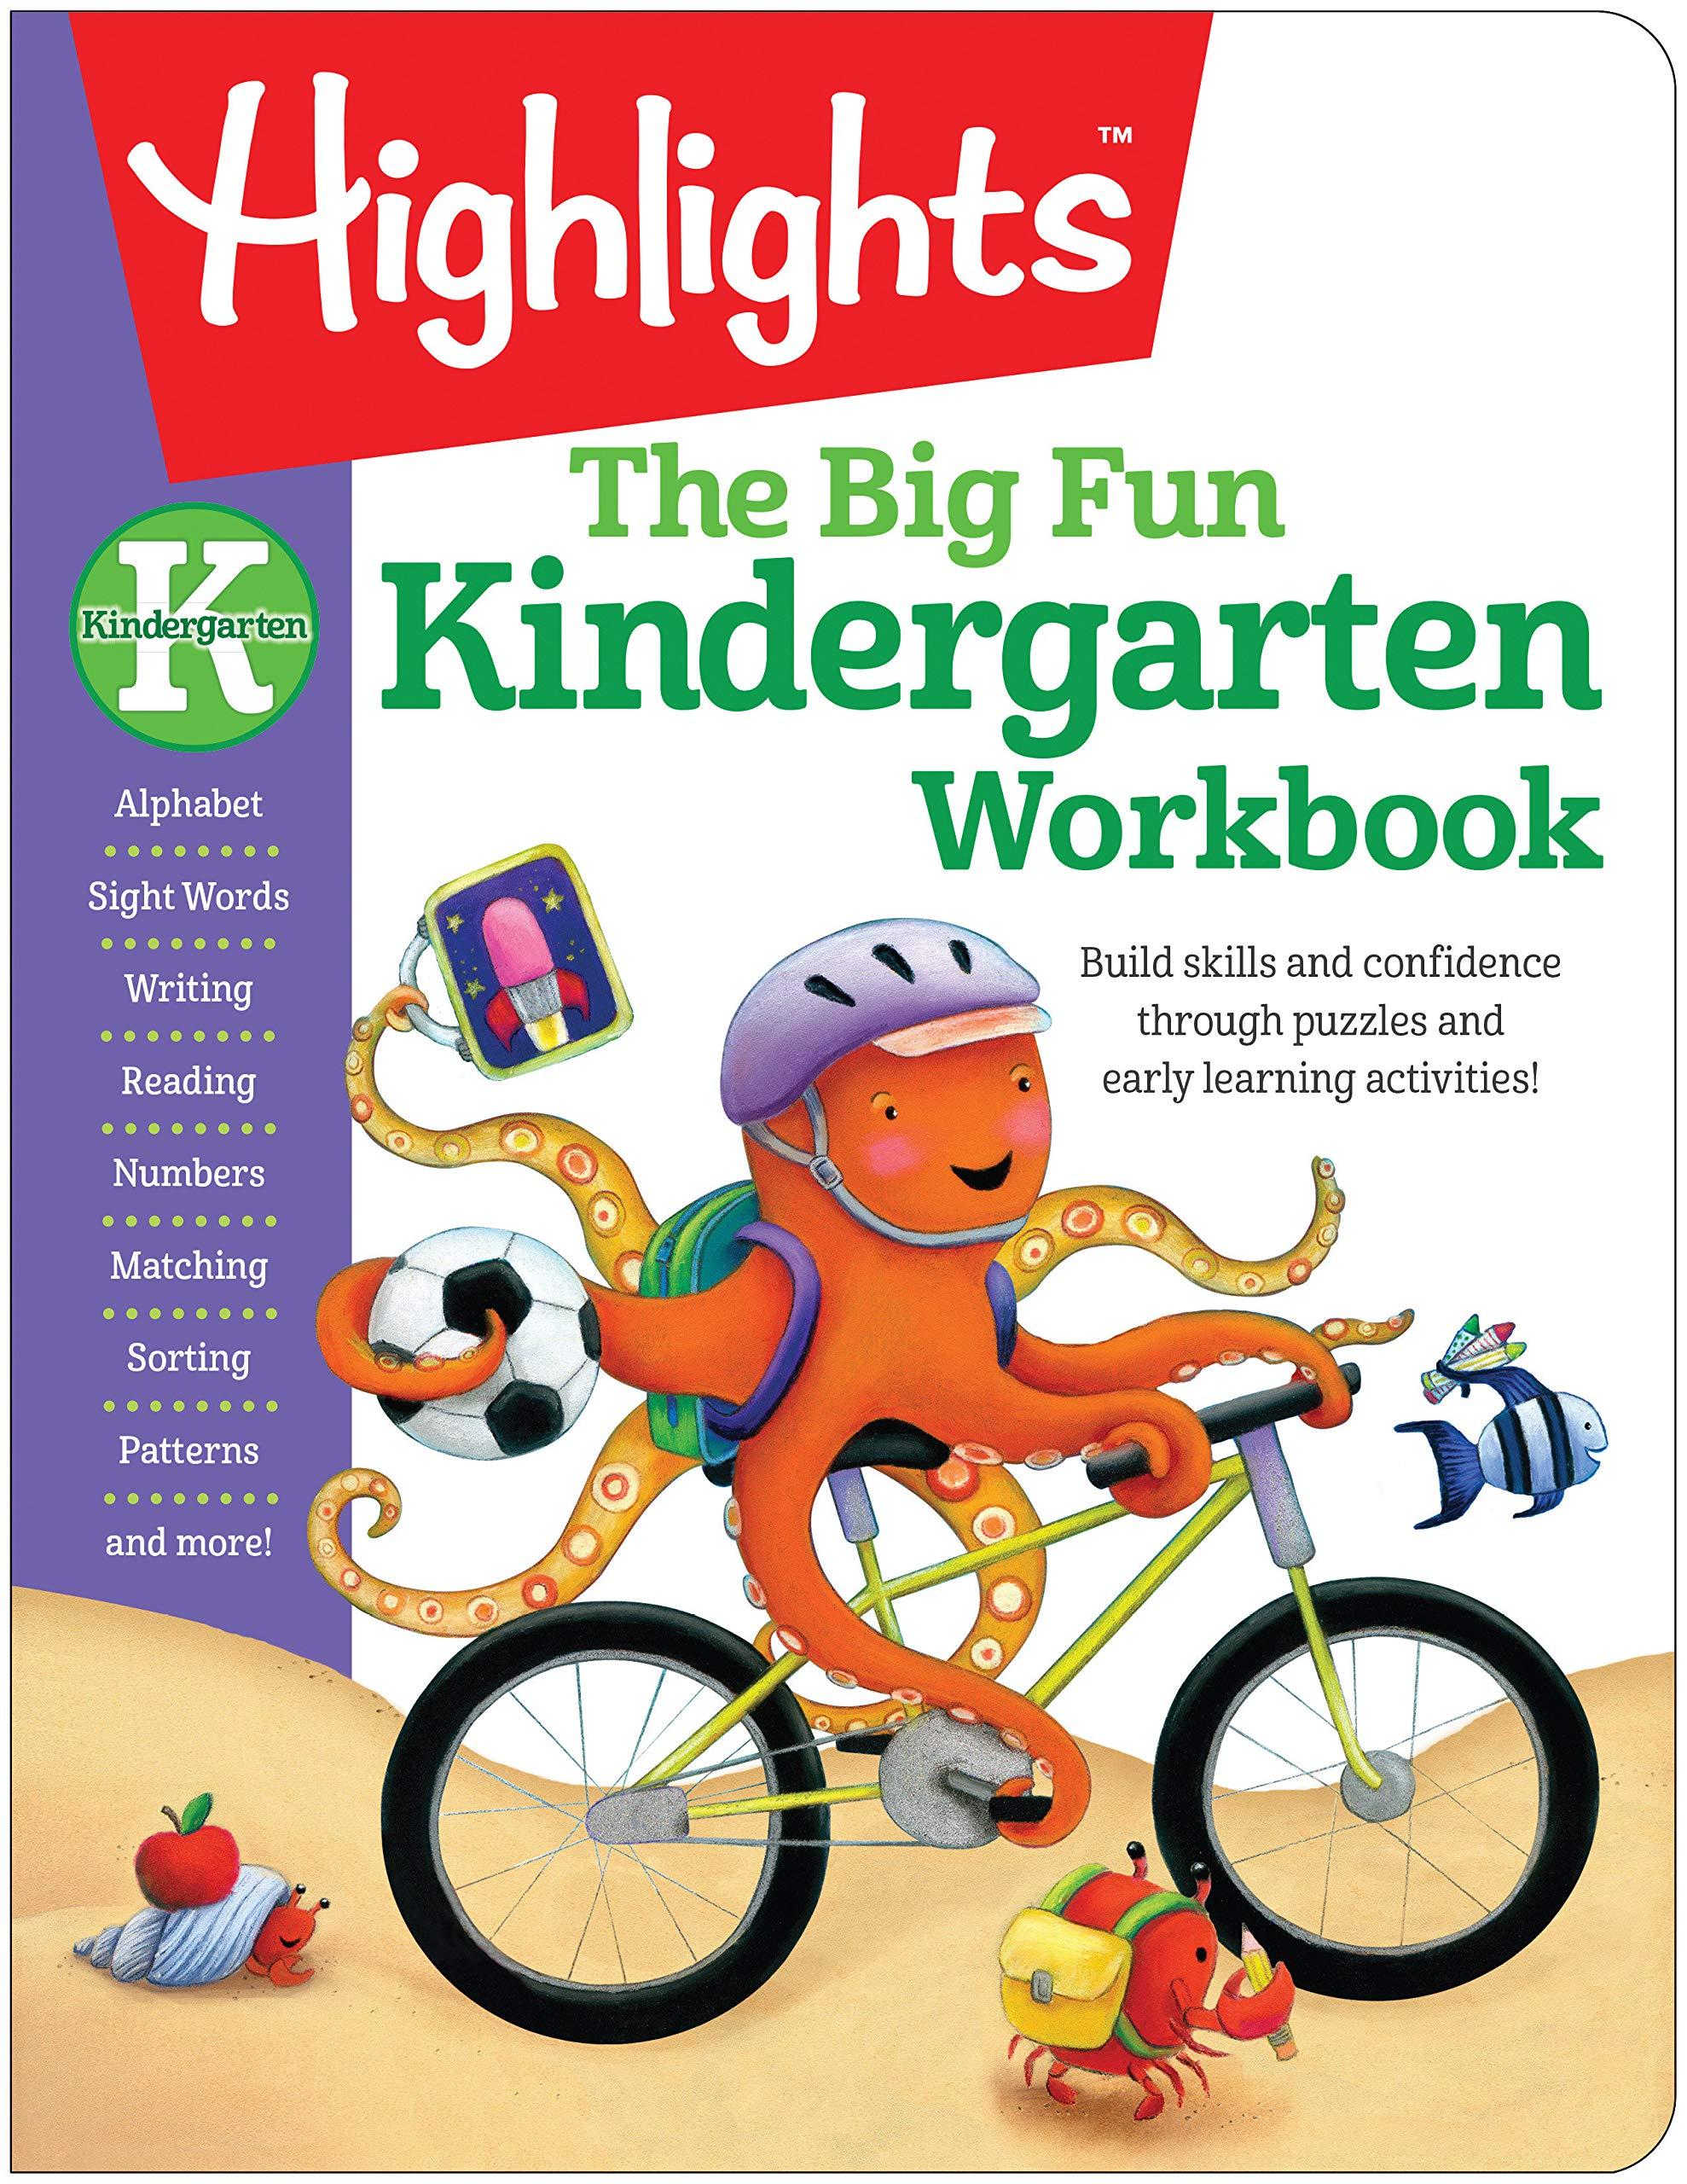 Amazoncom The Big Fun Kindergarten Workbook Highlights Big Fun